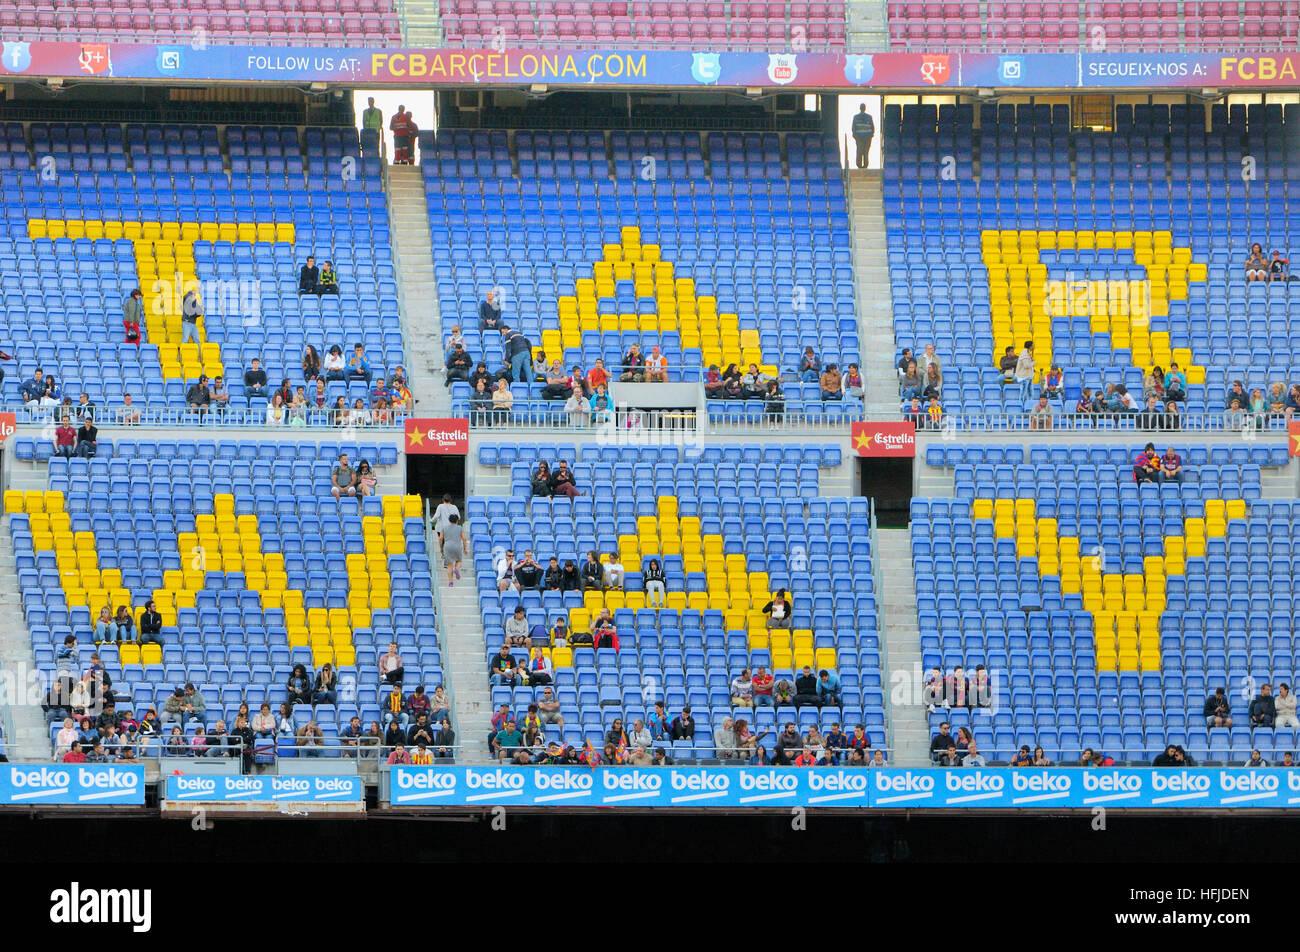 Camp Nou, Football club Barcelona stadium. Barcelona, Catalonia, Spain - Stock Image